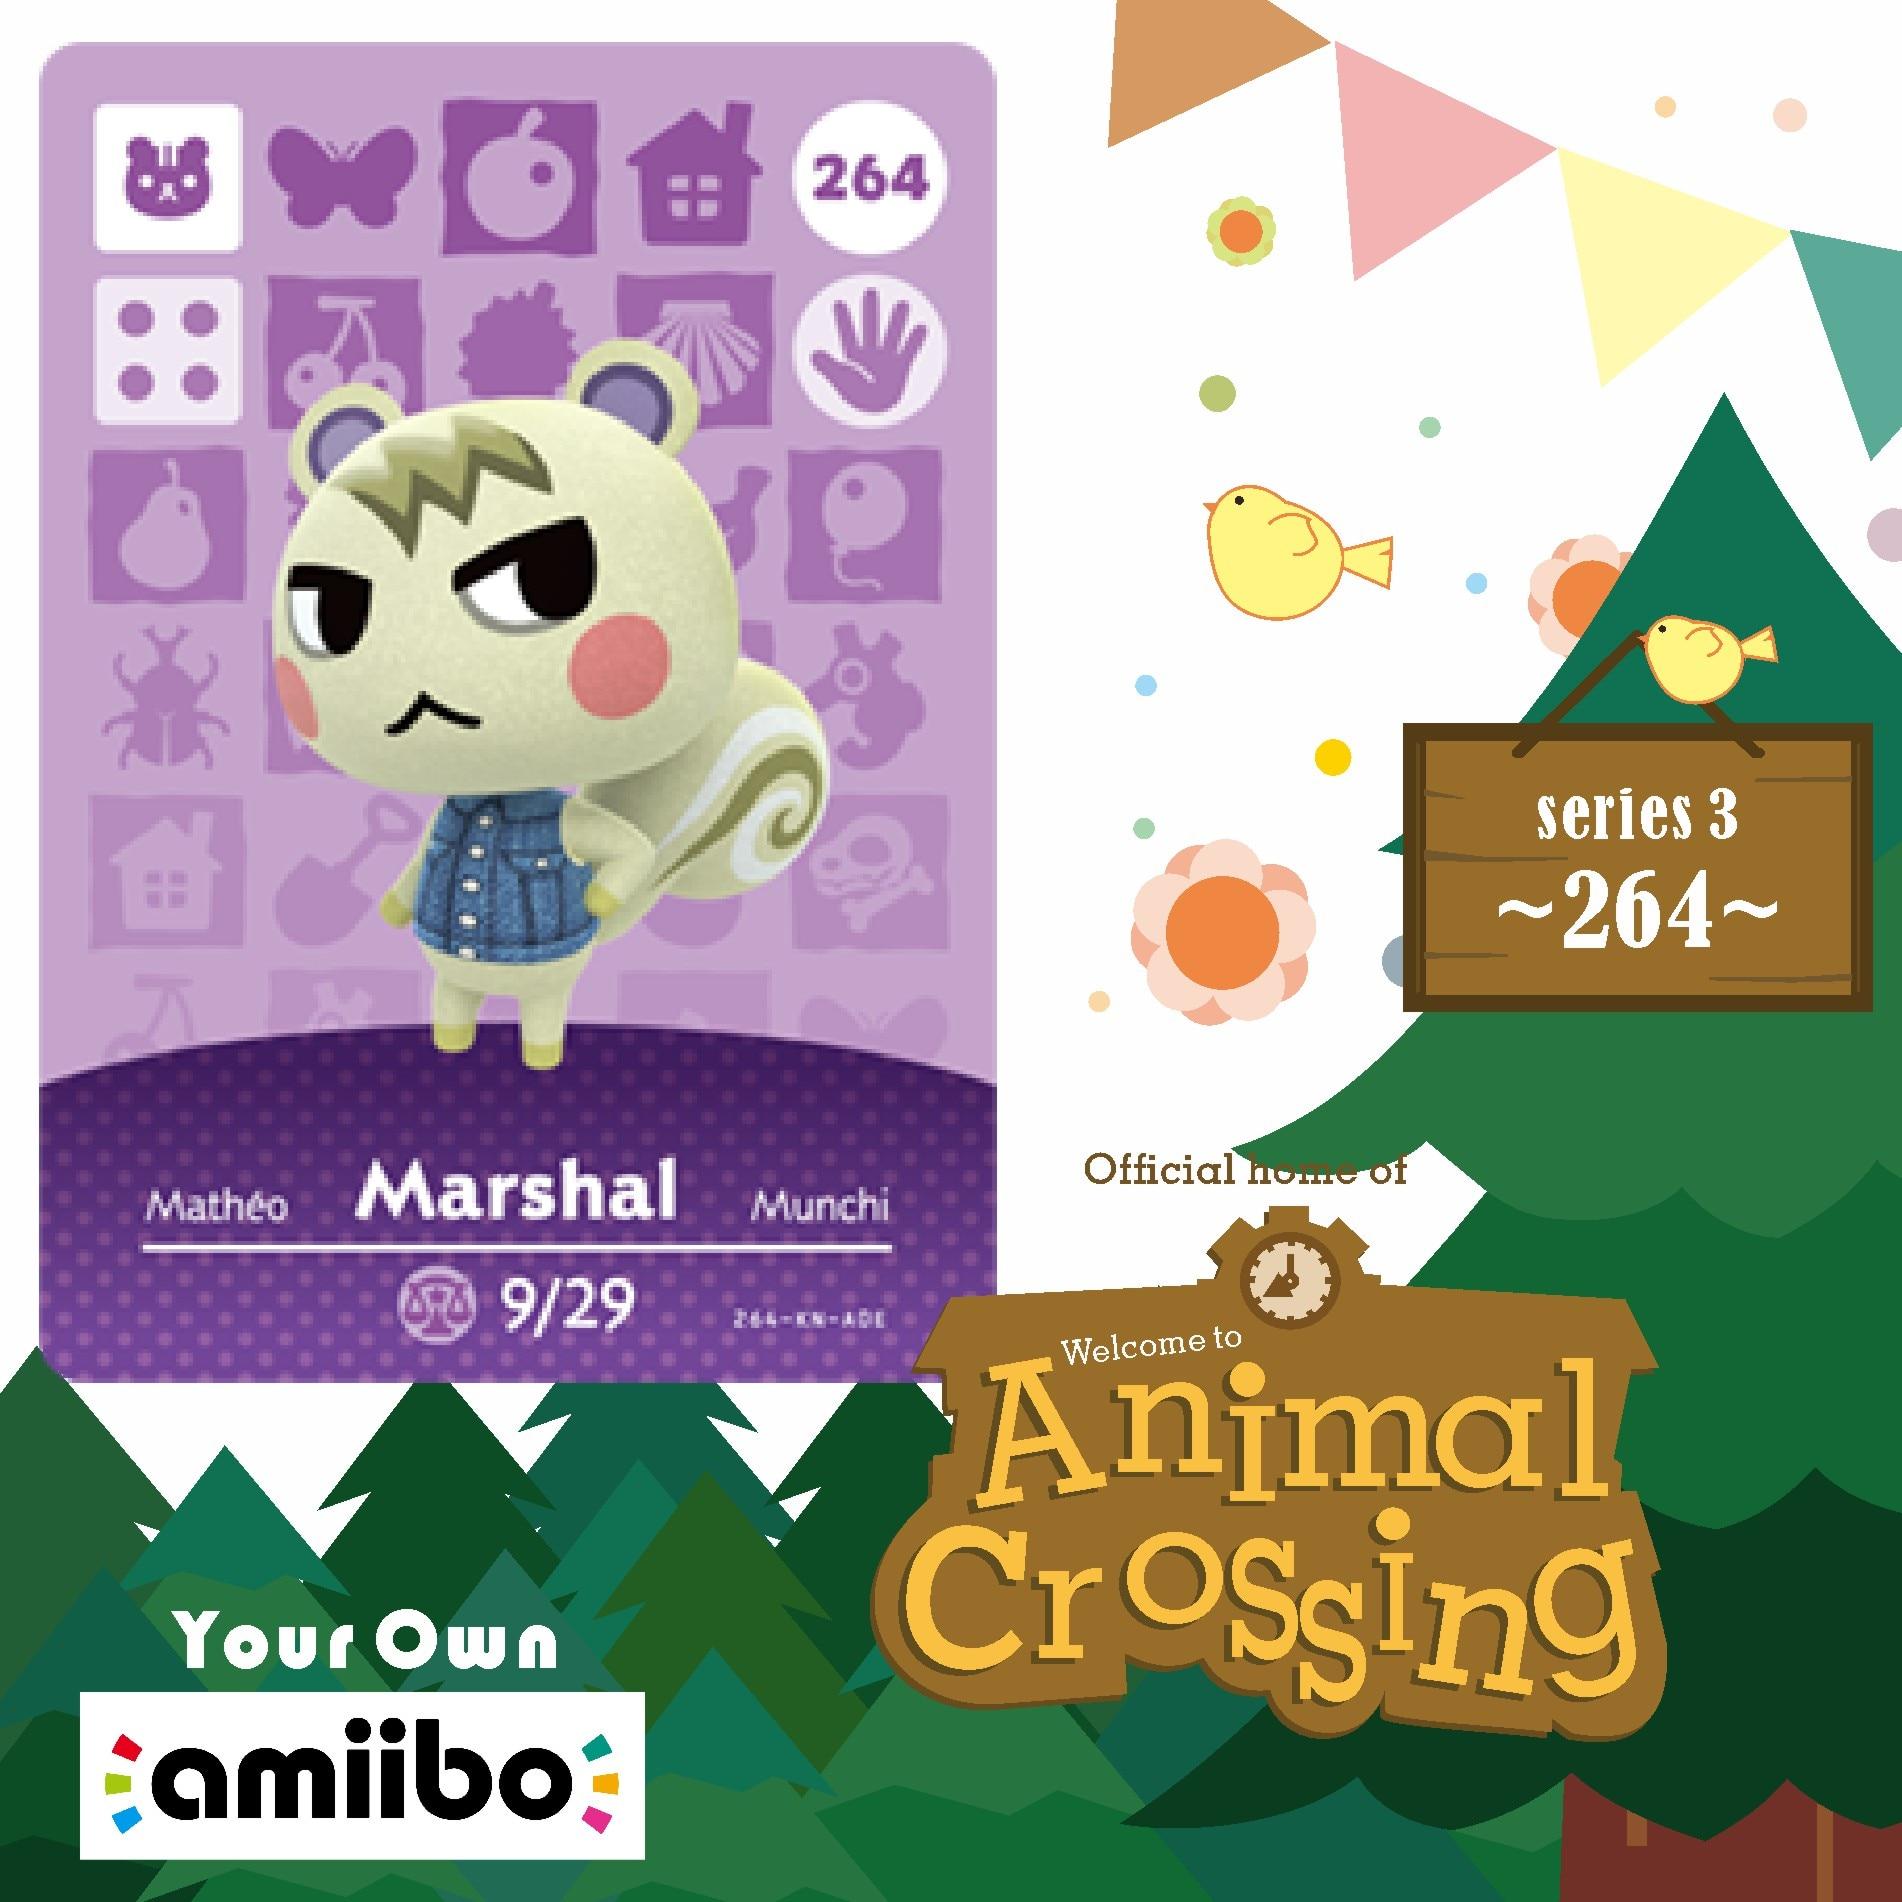 Welcome Amiibo Card Card Marshal Animal Crossing Marshal Animal Crossing Marshal Animal Crossing Marshal Animal Crossing Marshal